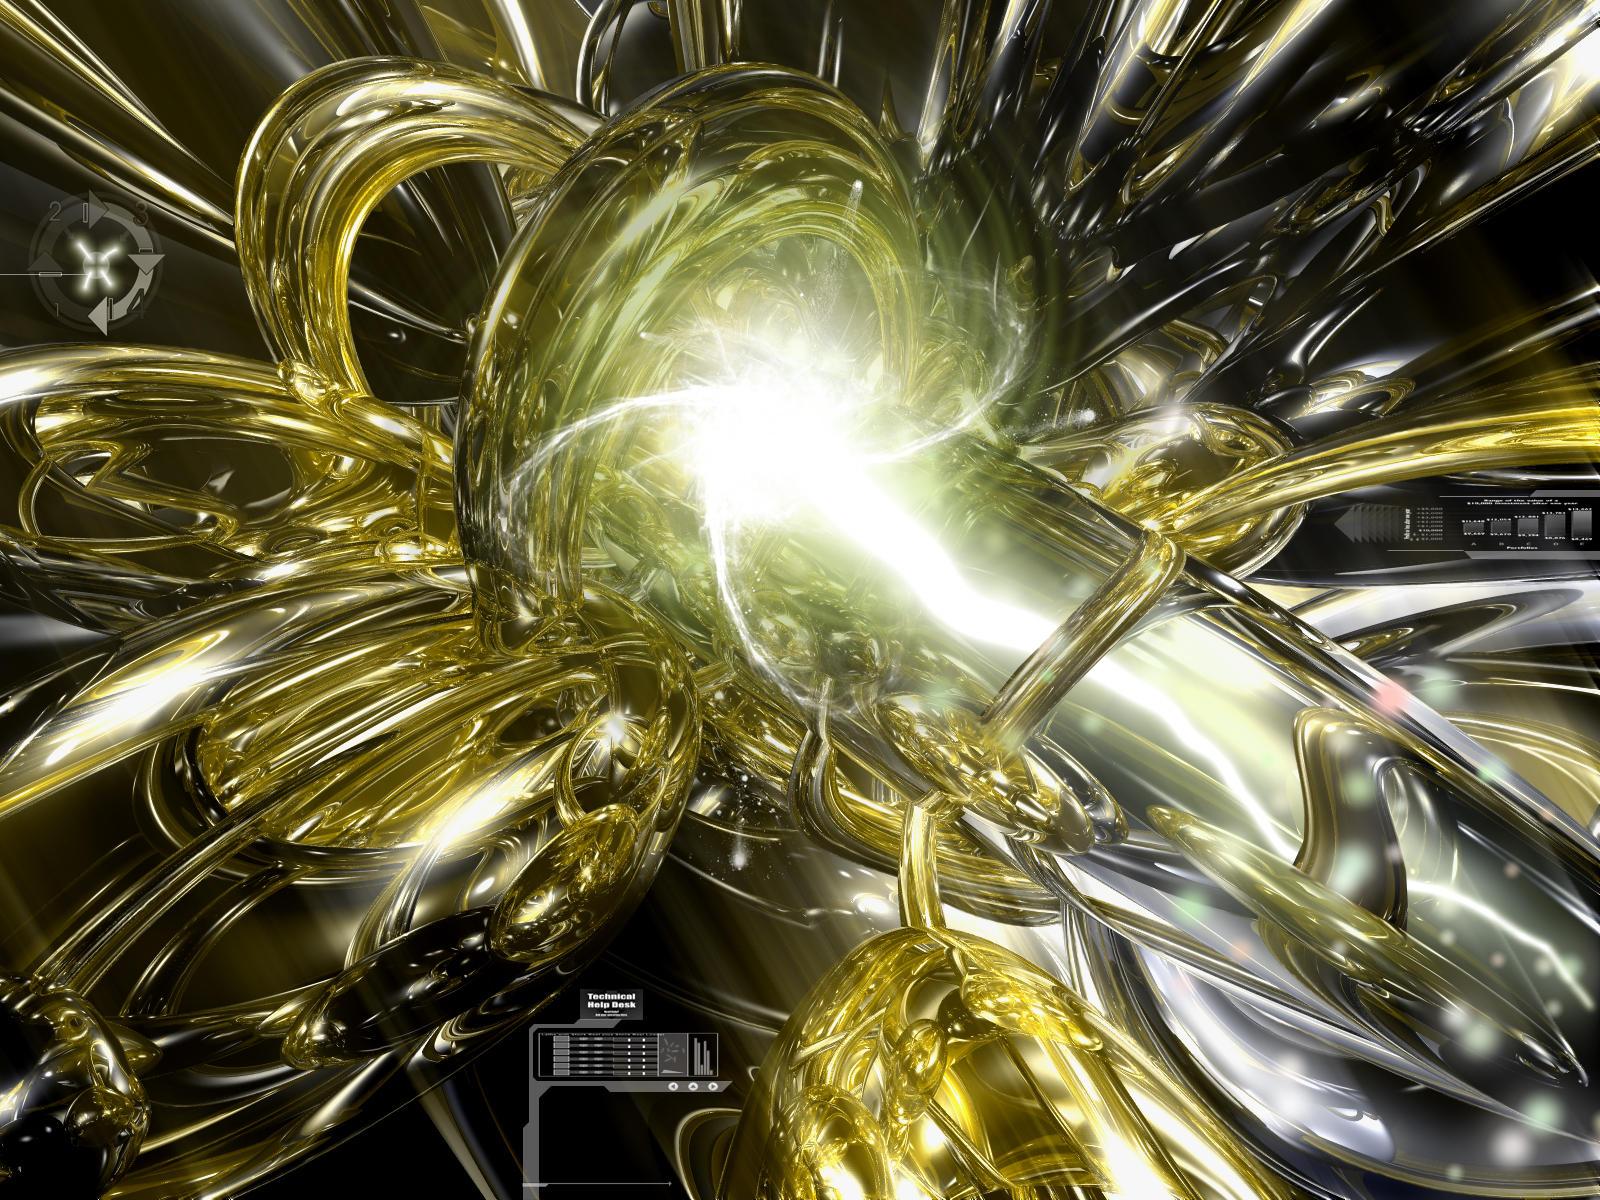 SoulGate by viperv6